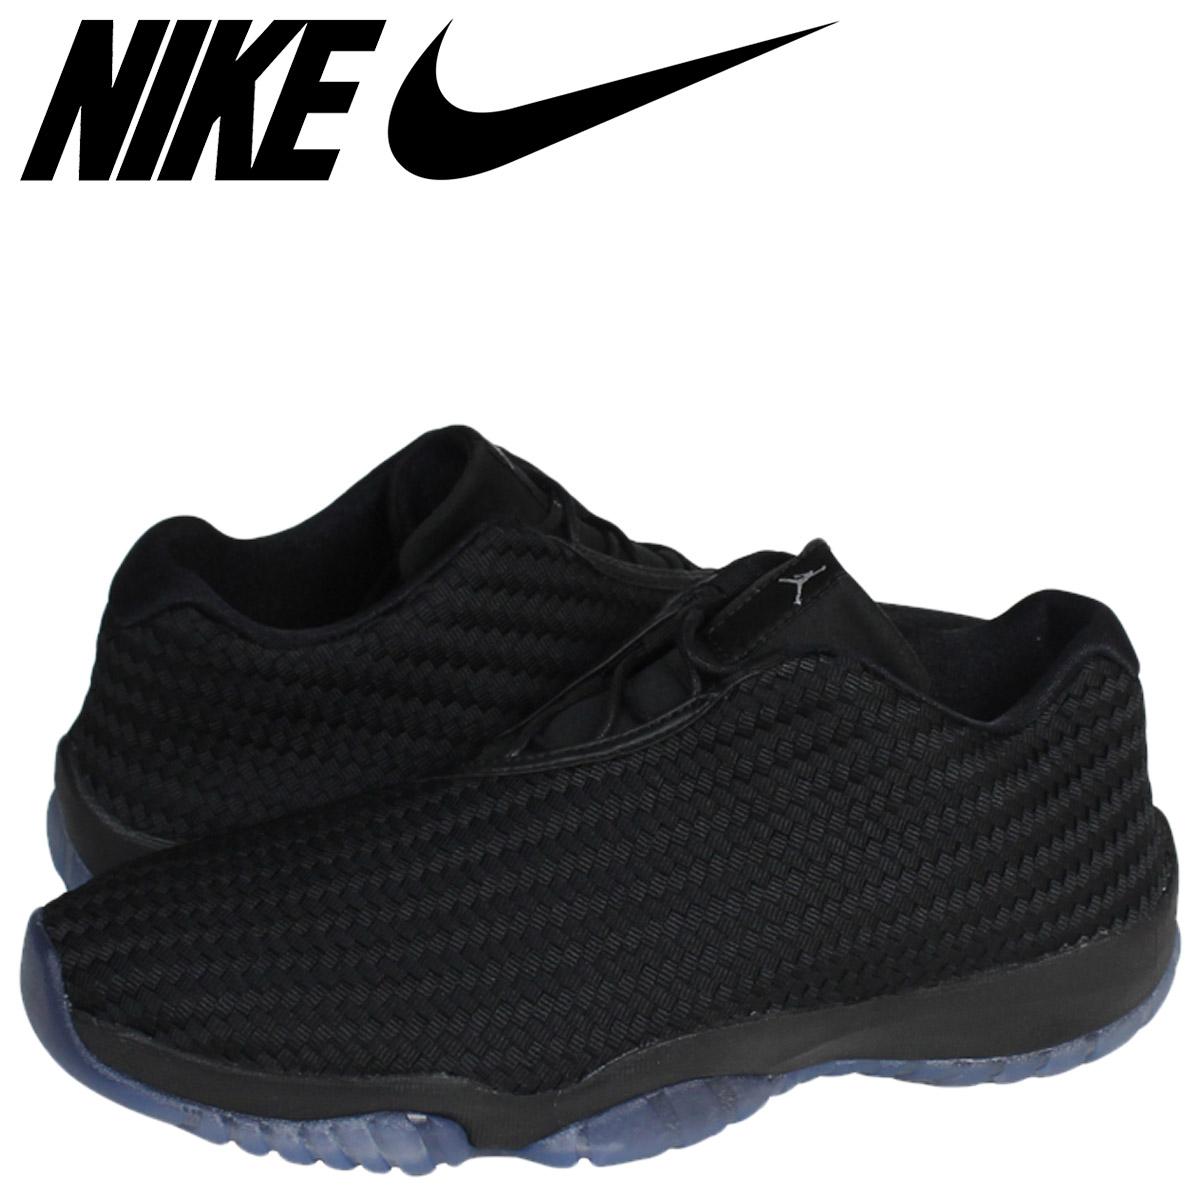 sports shoes 4694a 2df49 purchase sold out no 29 cm lid nike nike air jordan sneakers air jordan  future low